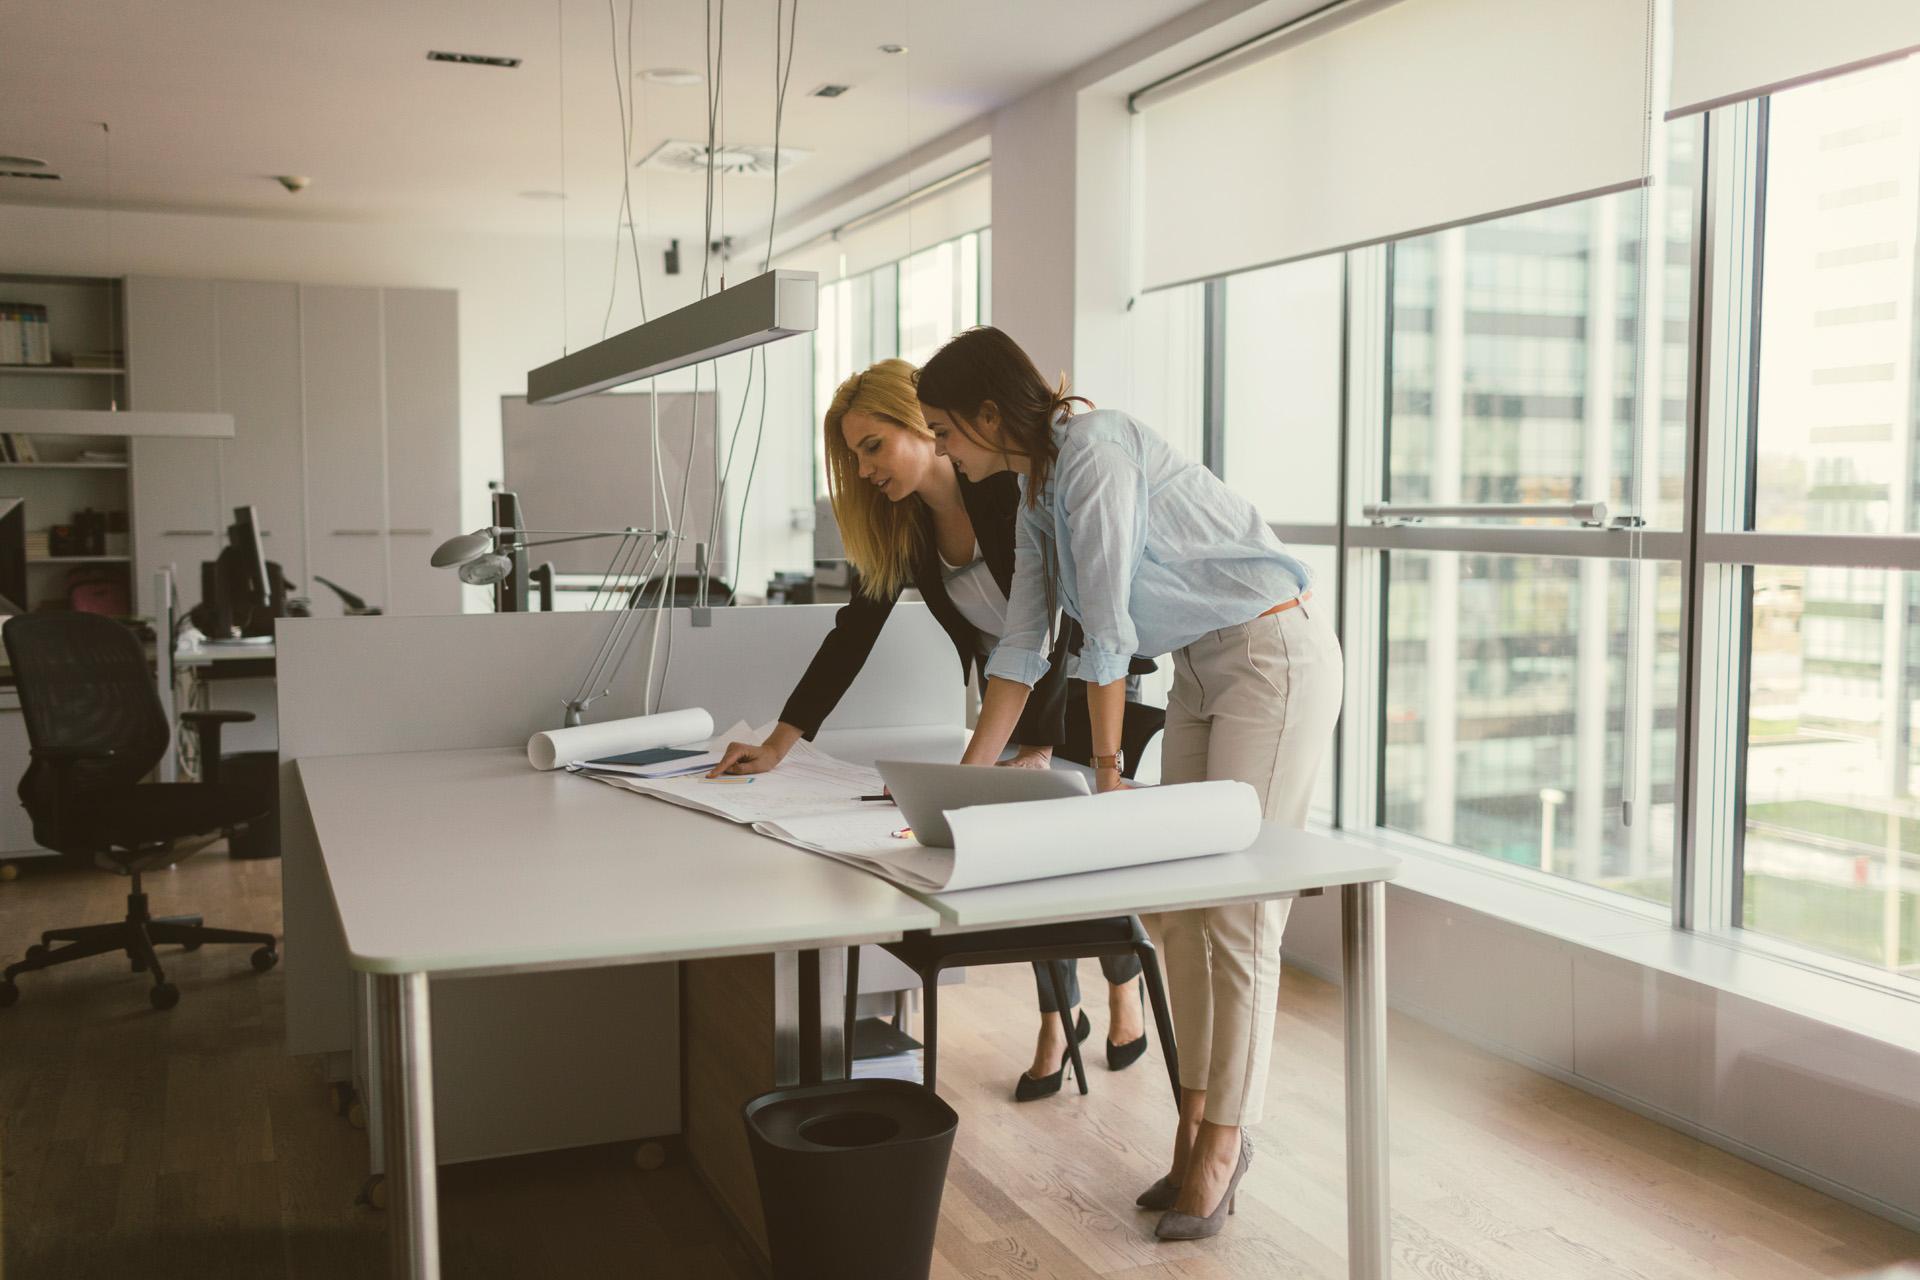 Businesswomen-working-in-the-office-670479796_8660x5773